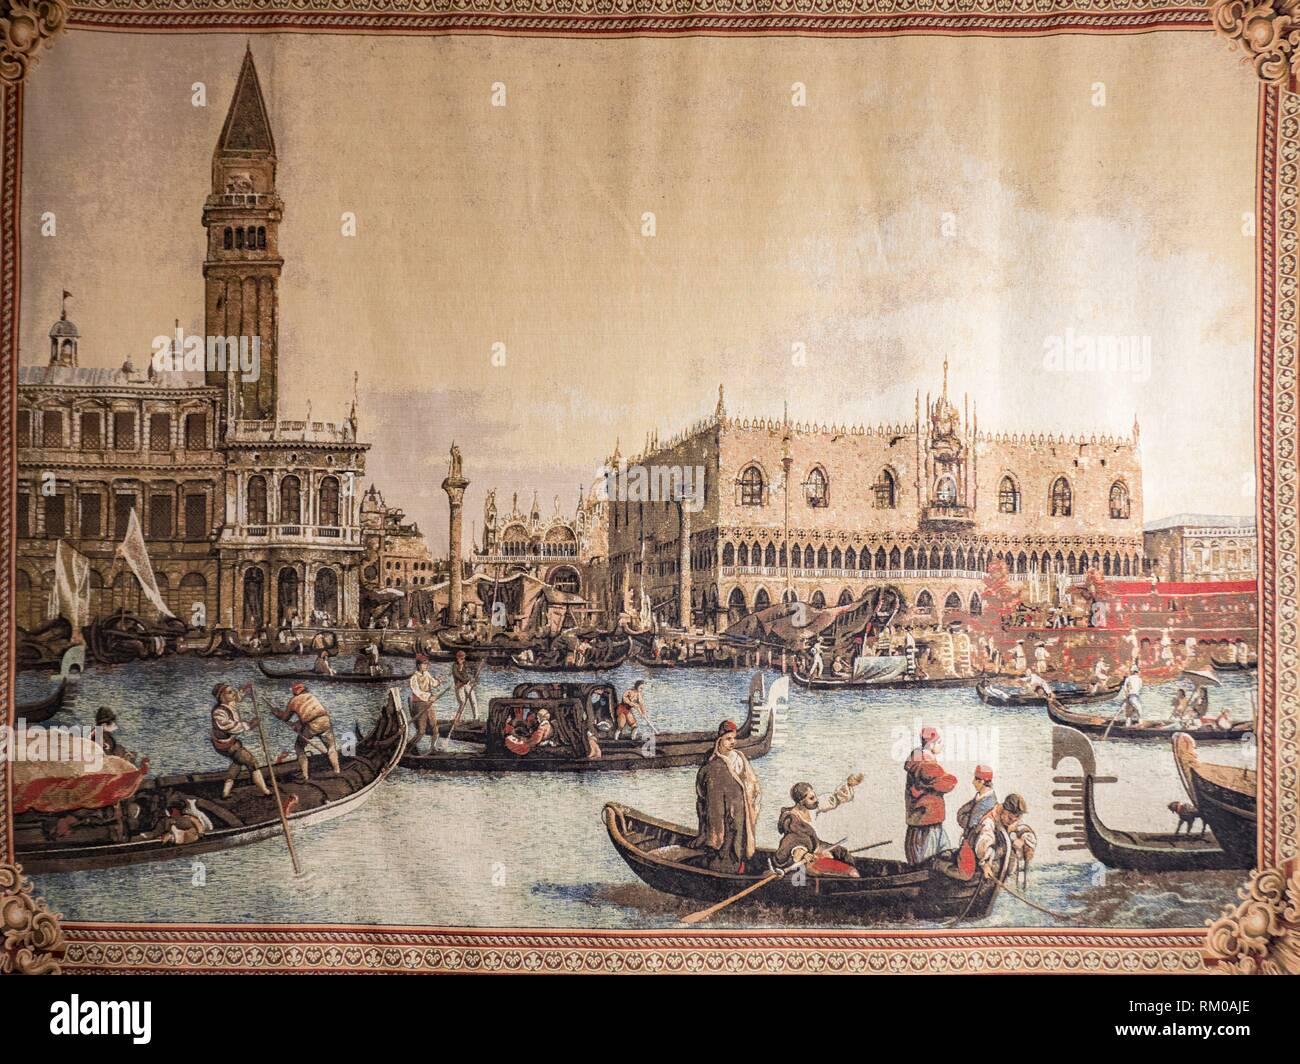 Rug, Island of Burano, Venice, Italy. - Stock Image